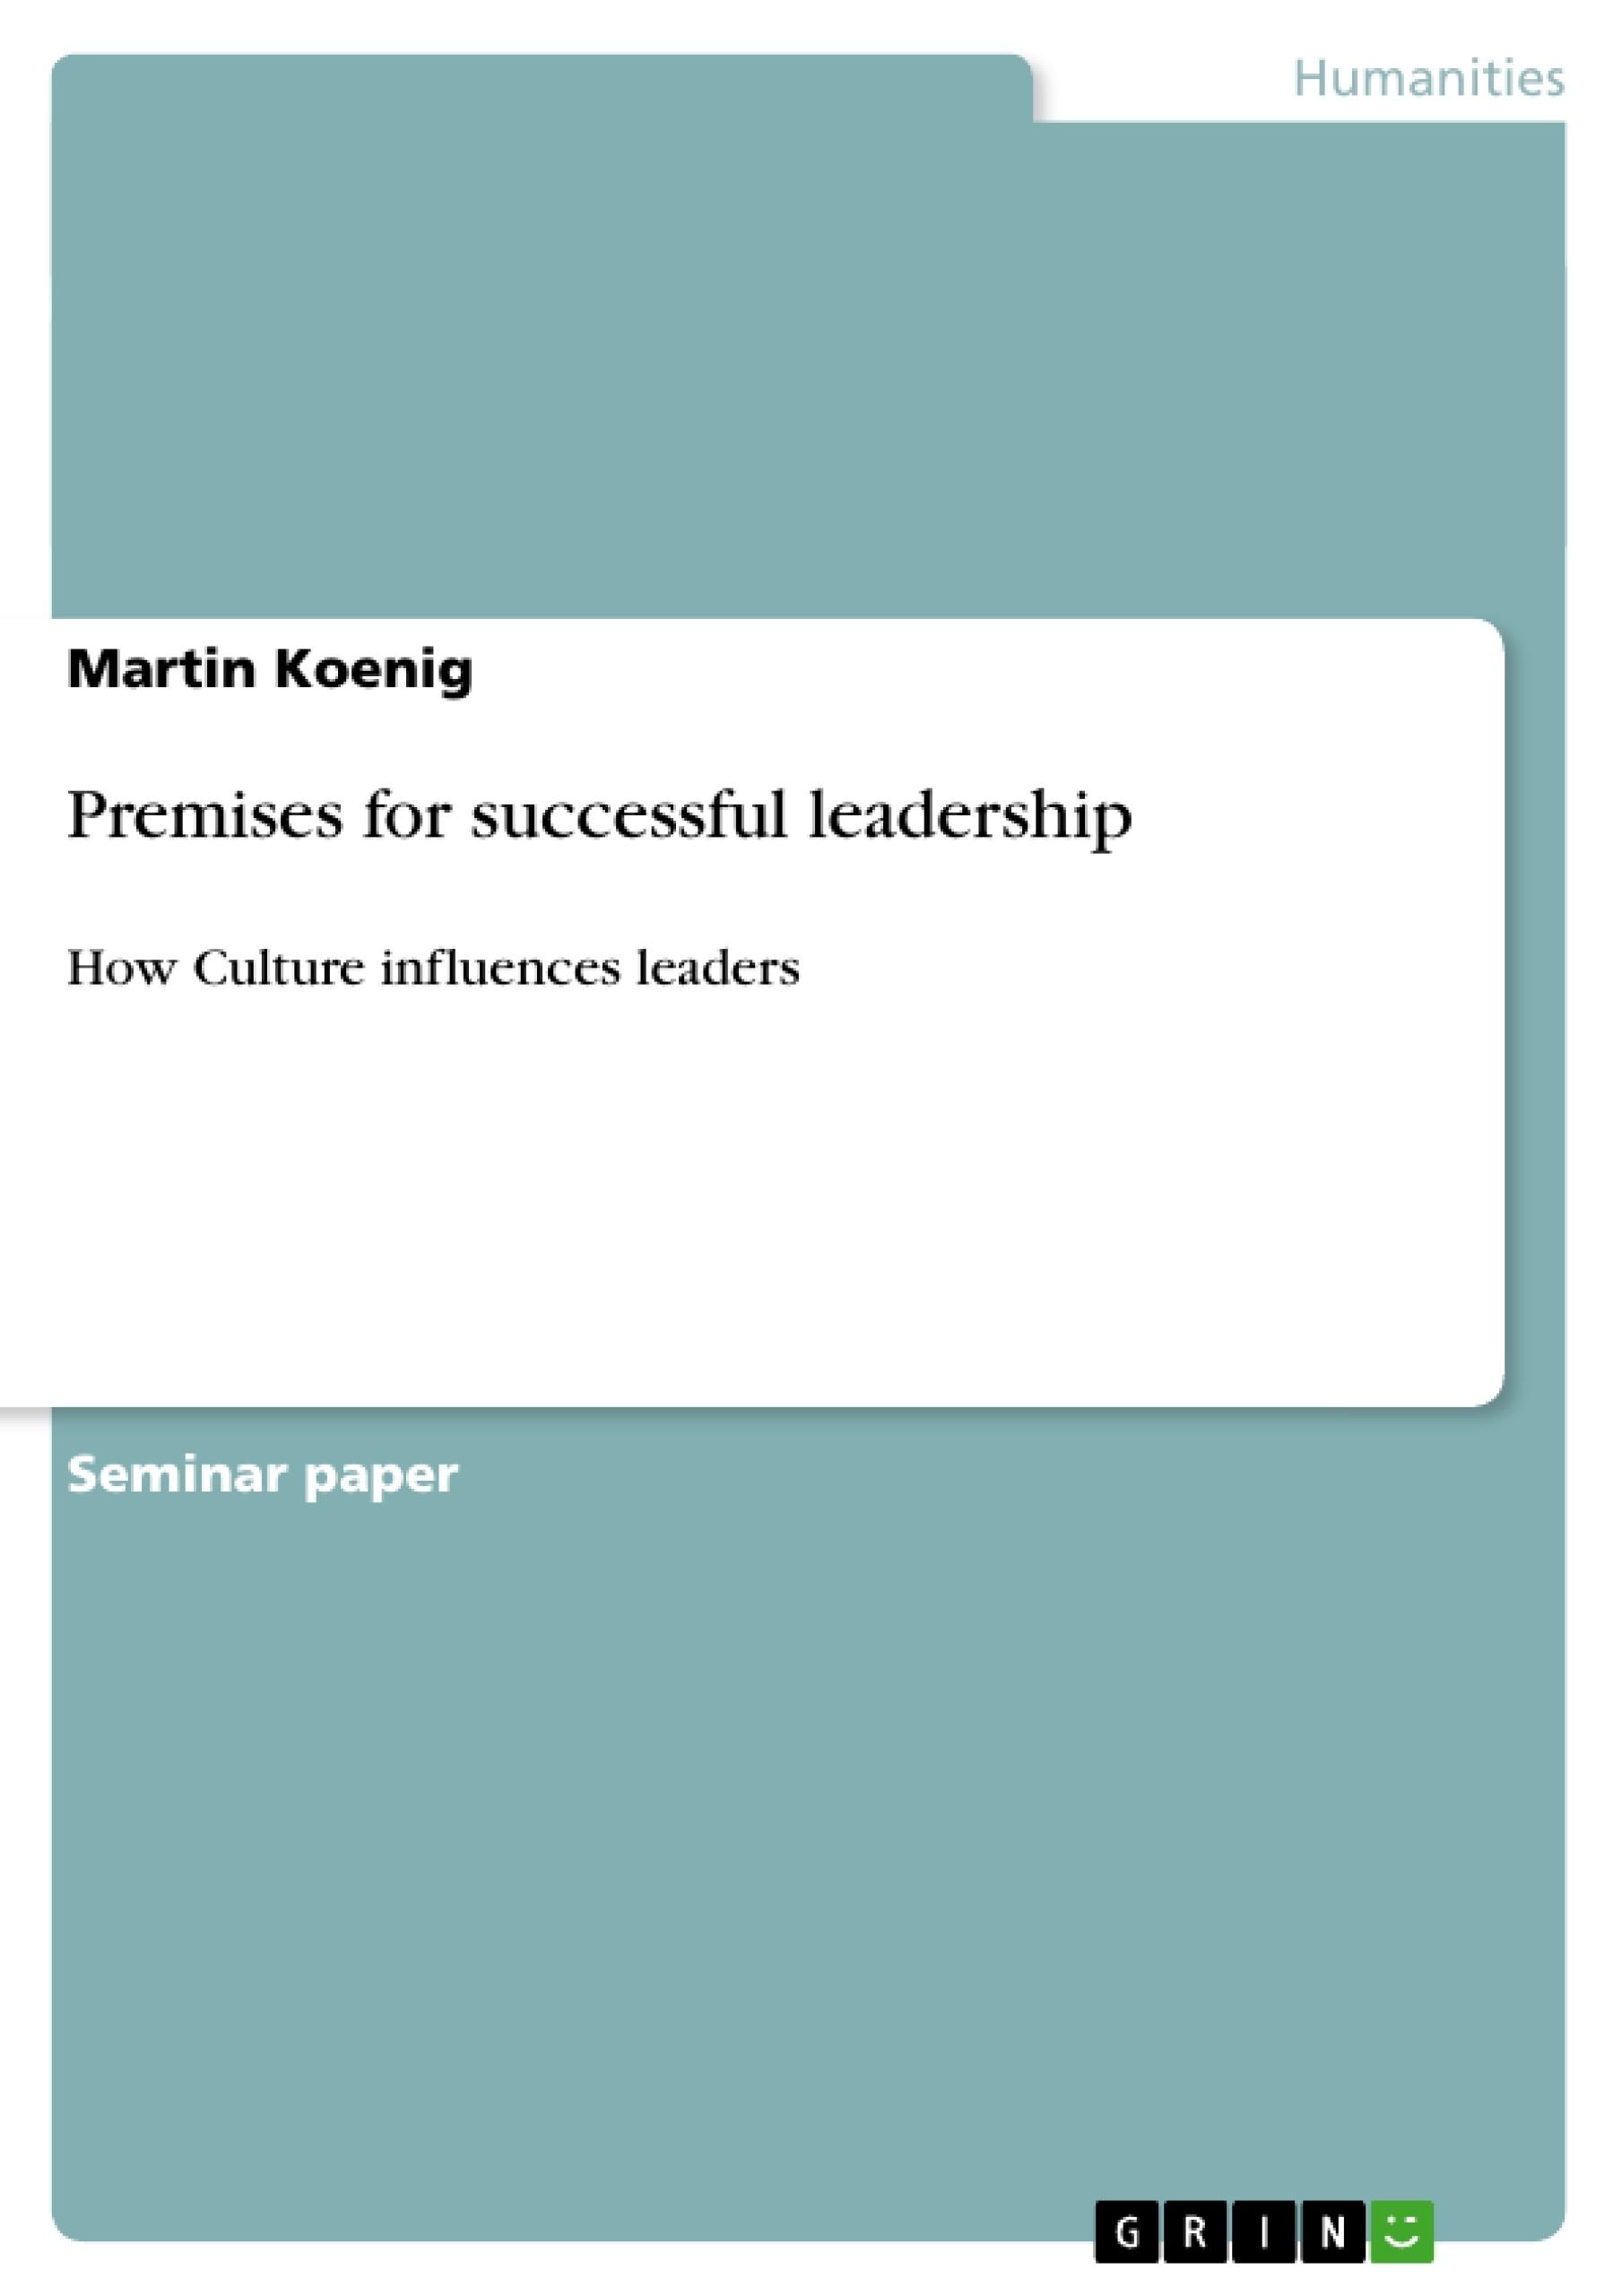 Title: Premises for successful leadership